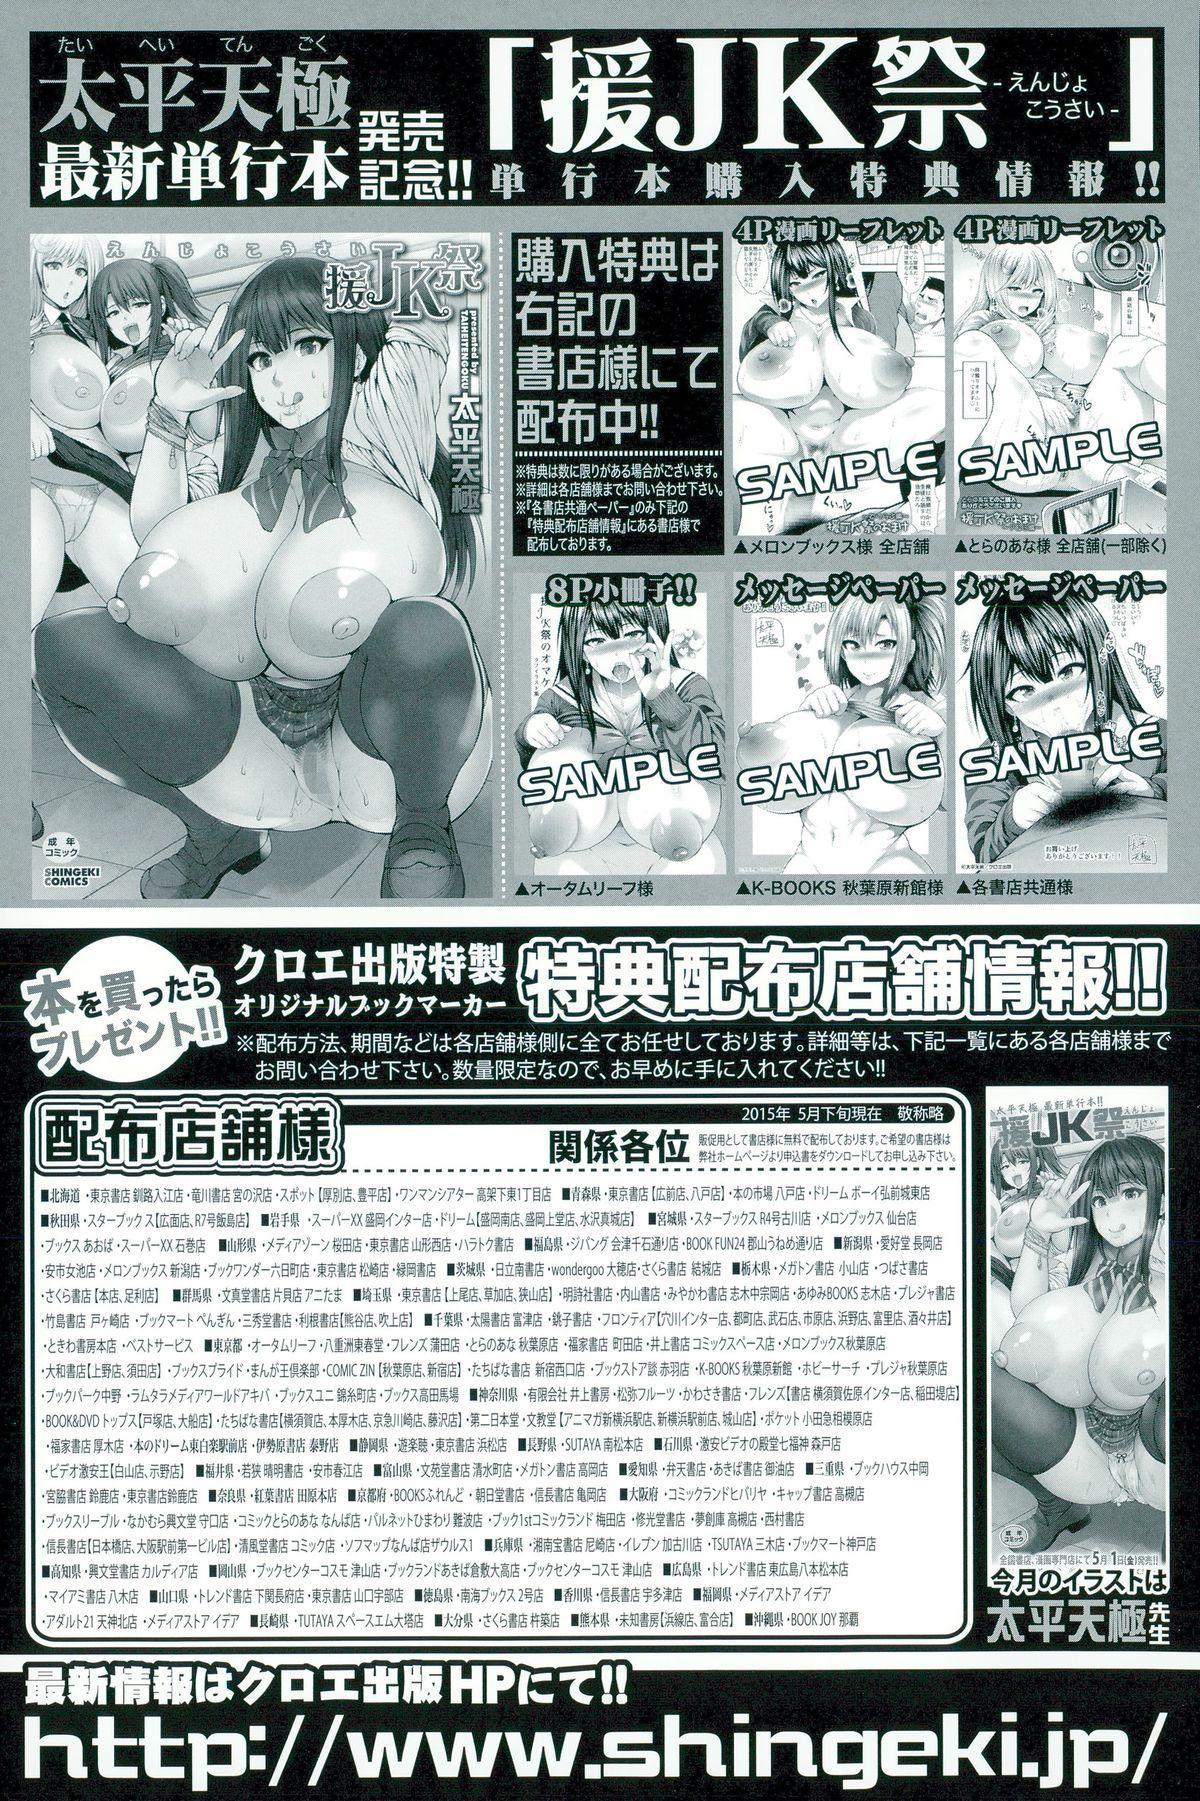 COMIC Shingeki 2015-07 373